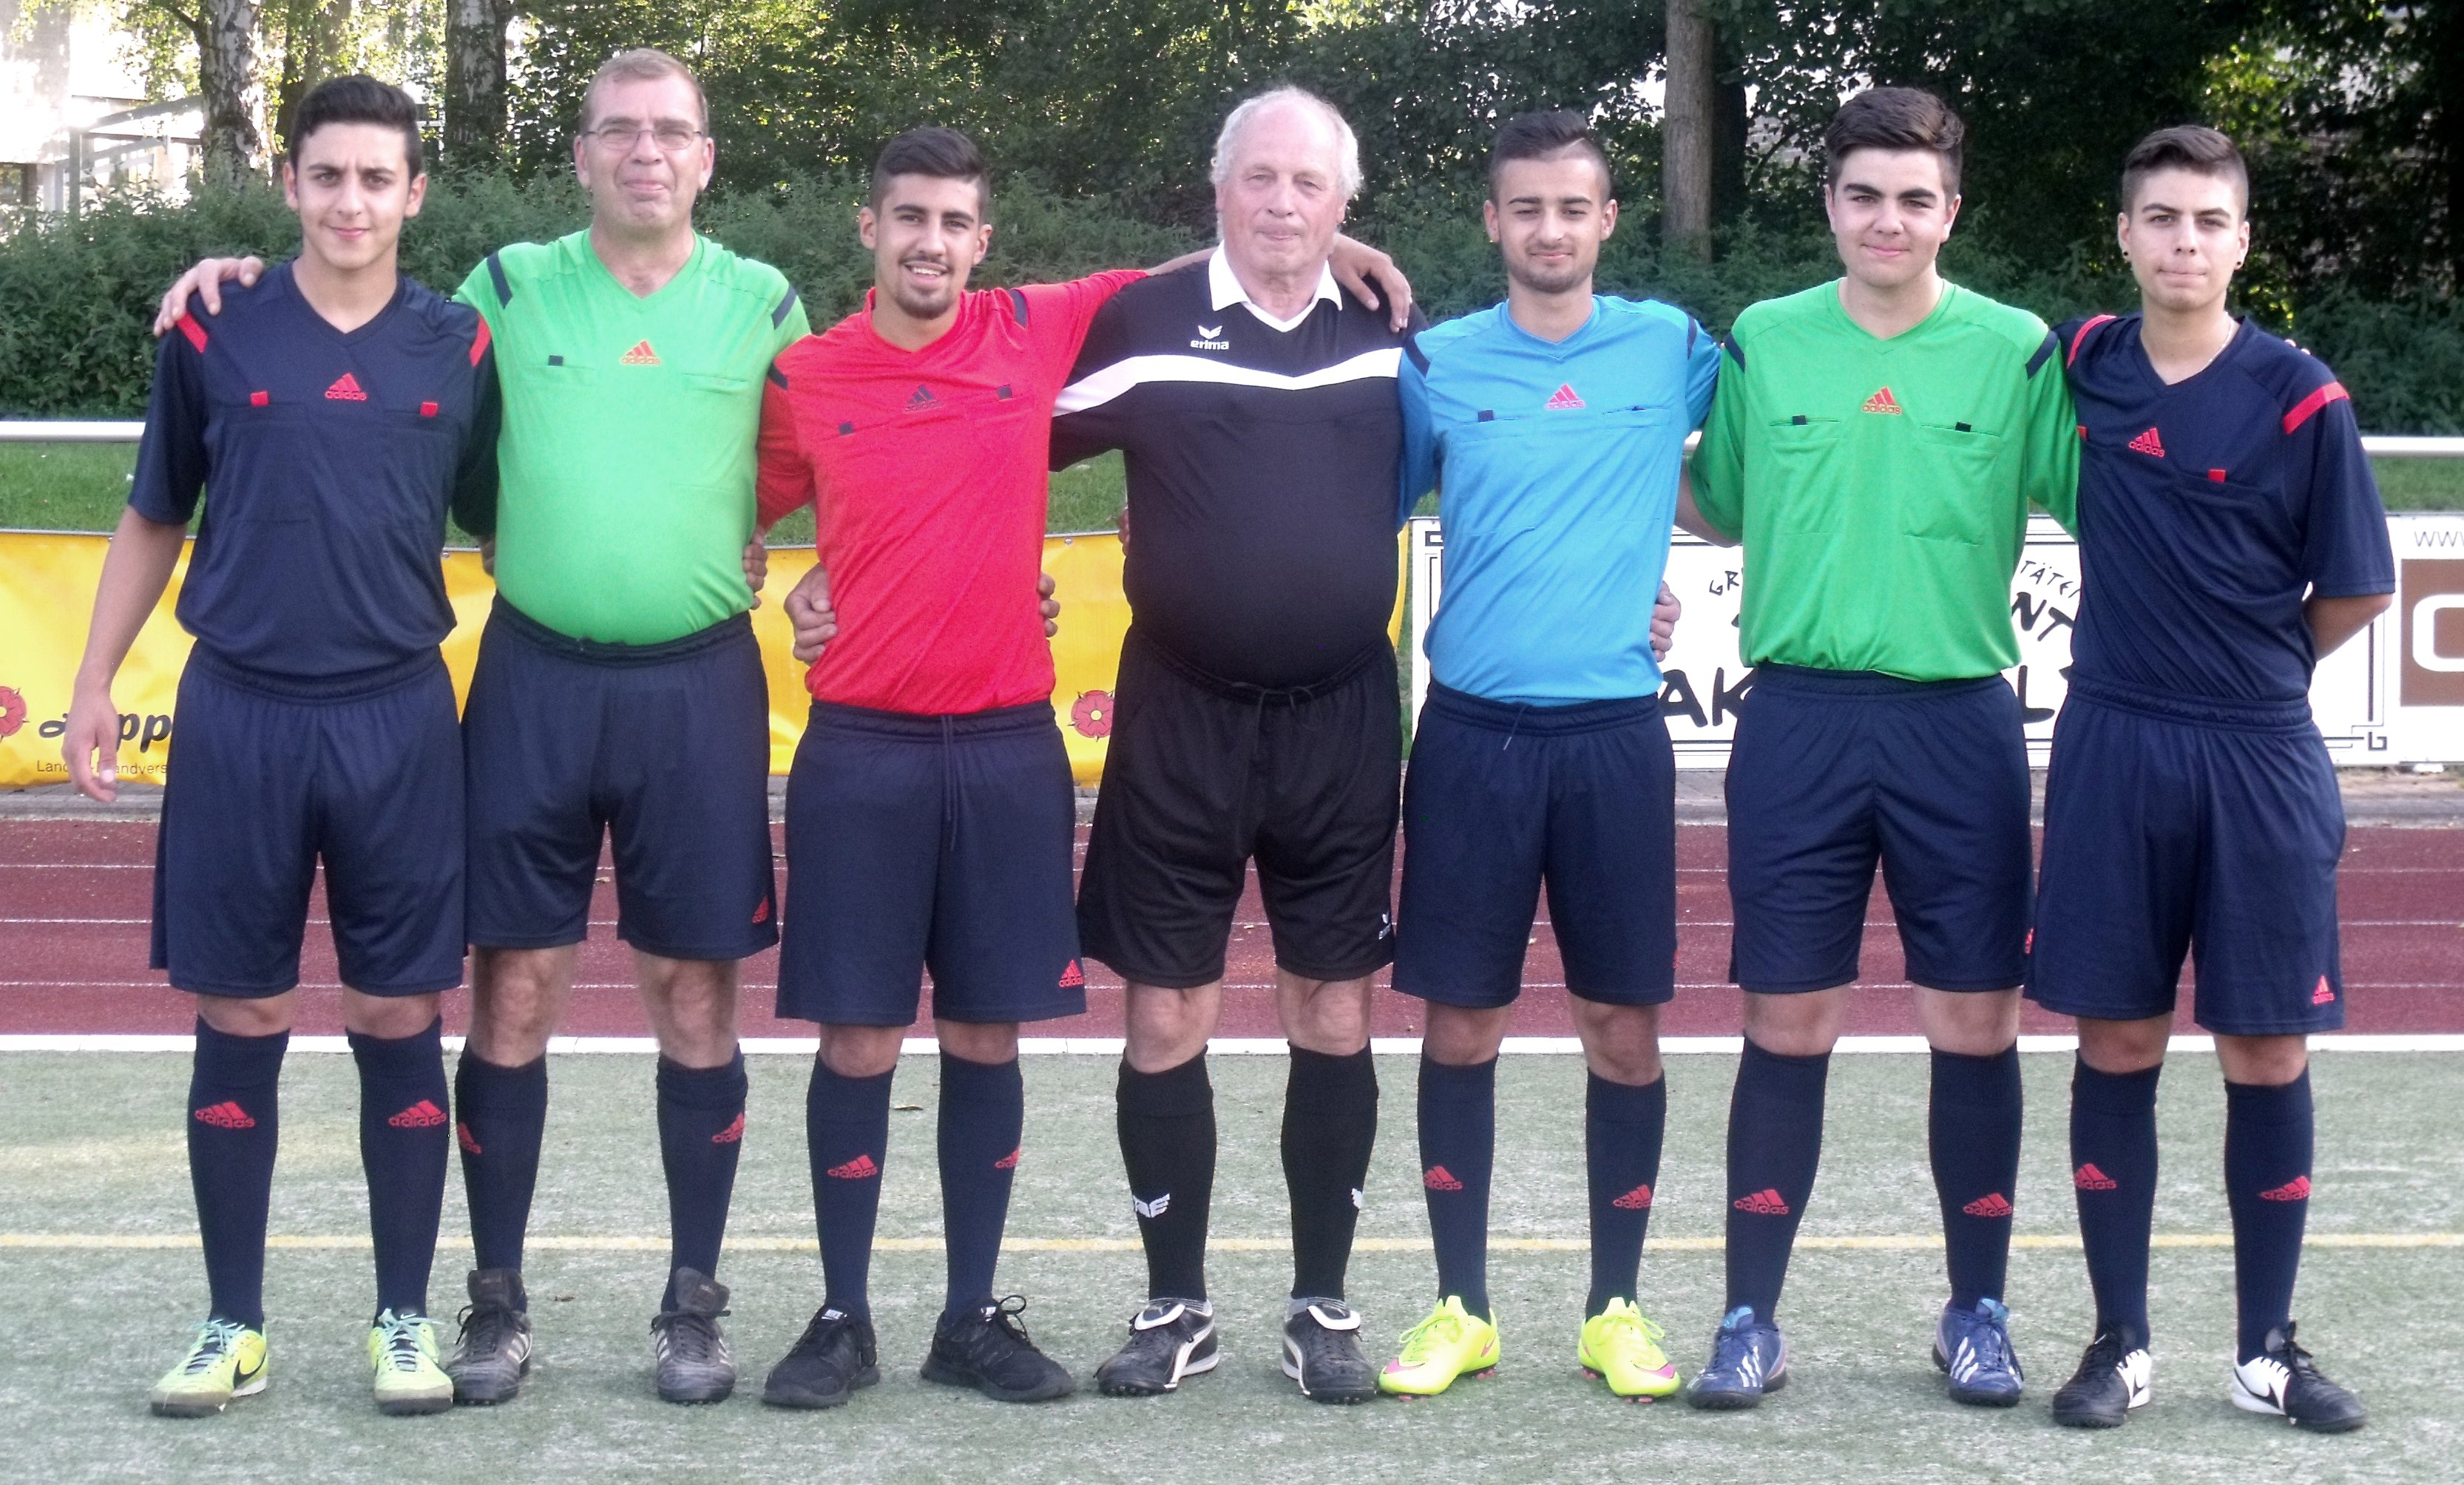 Schiedsrichter des POST TSV Detmold e.V.